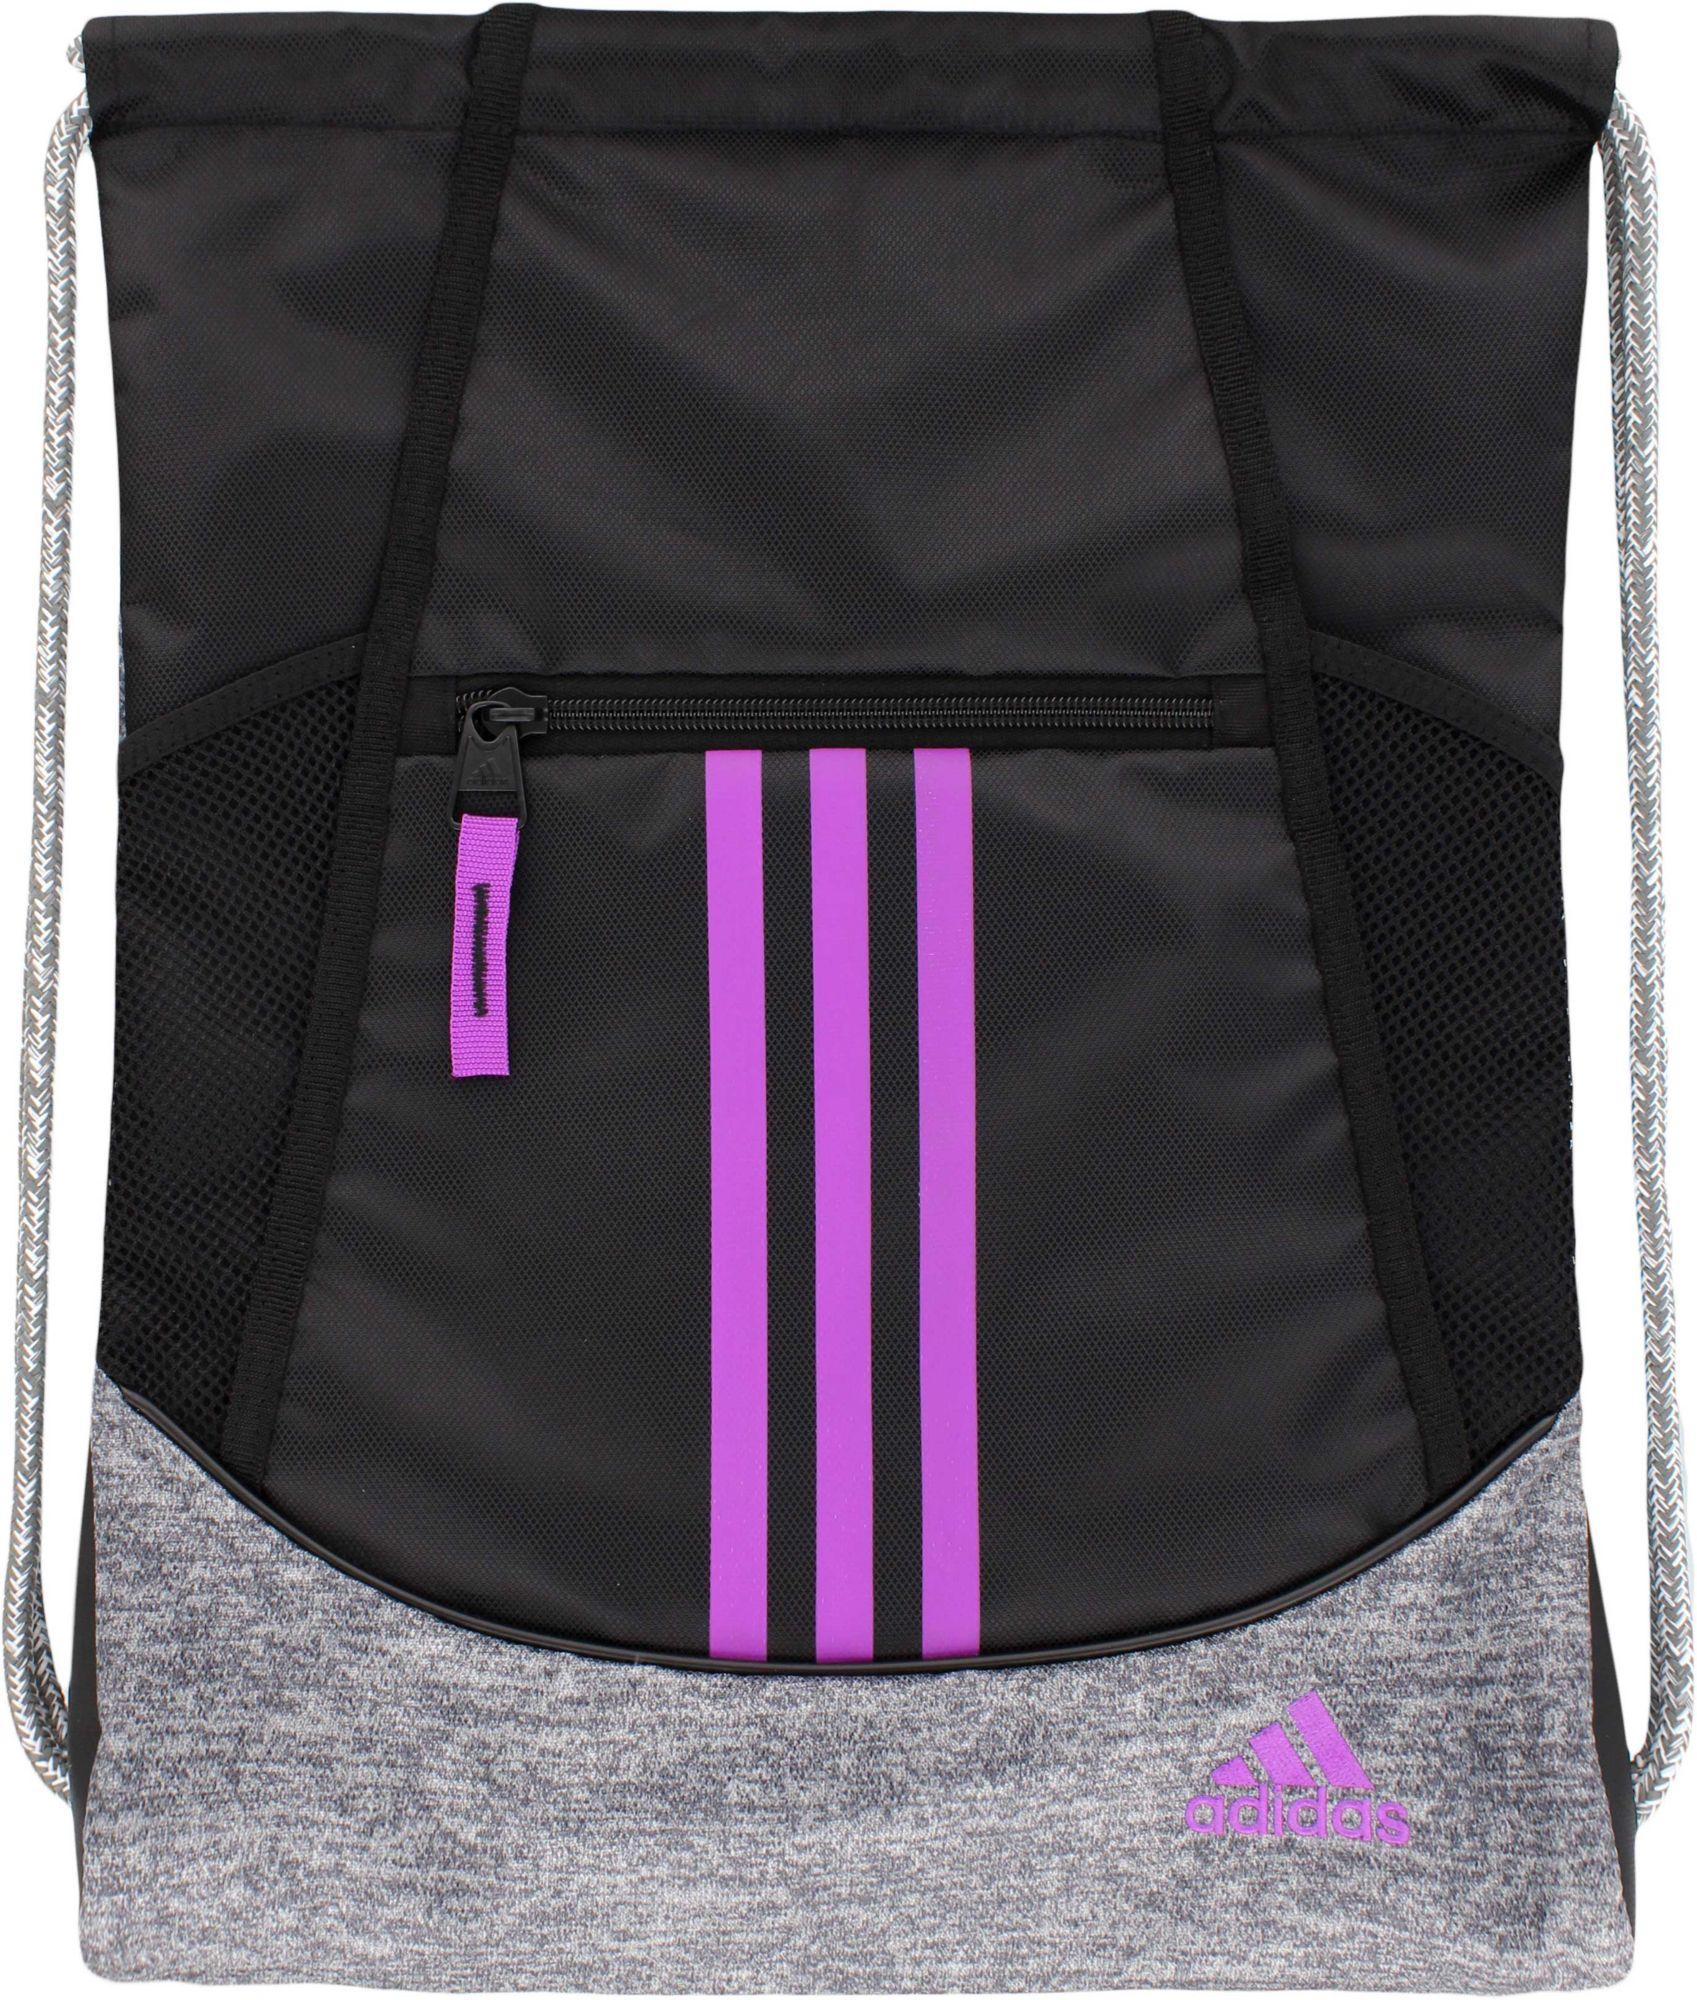 Adidas Alliance II saco Pack Dick 's Sporting goods